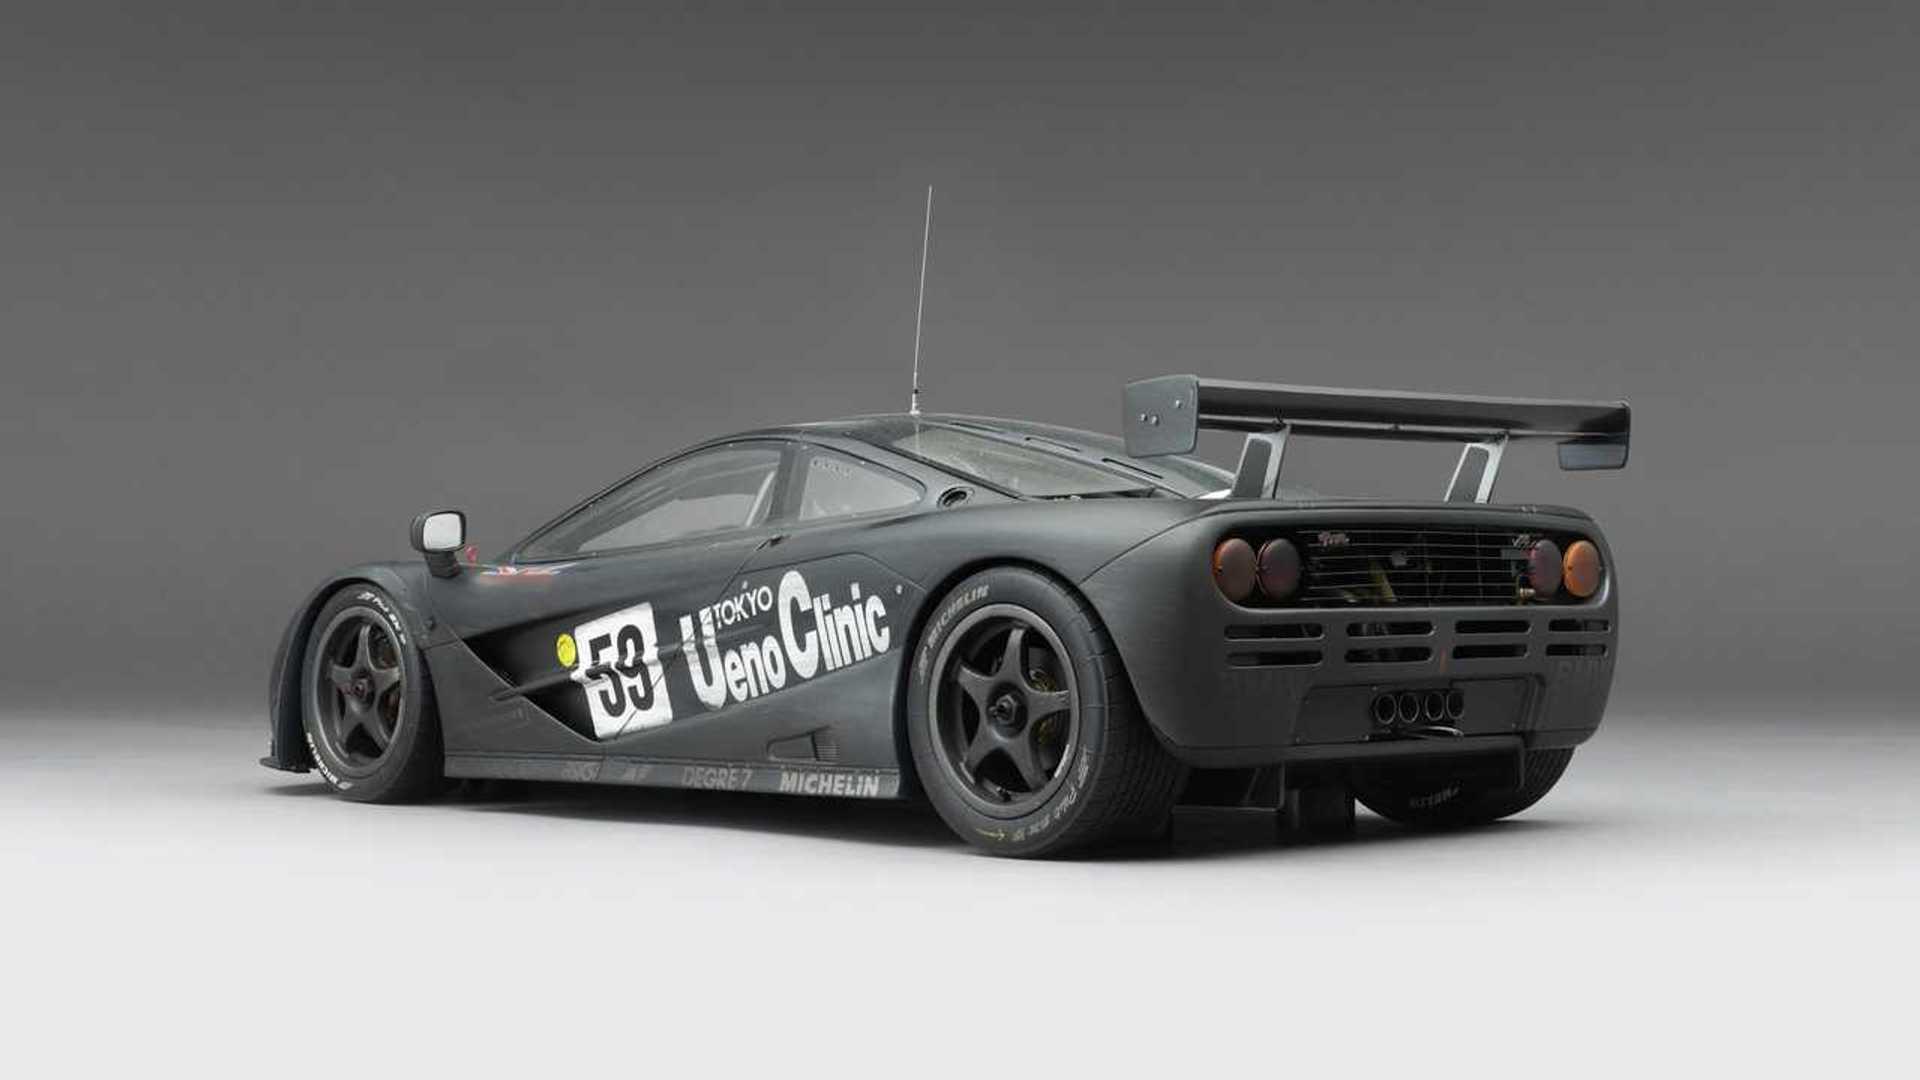 Amalgam Collection: McLaren F1 GTR Ueno Clinic 1995 Le Mans Winner